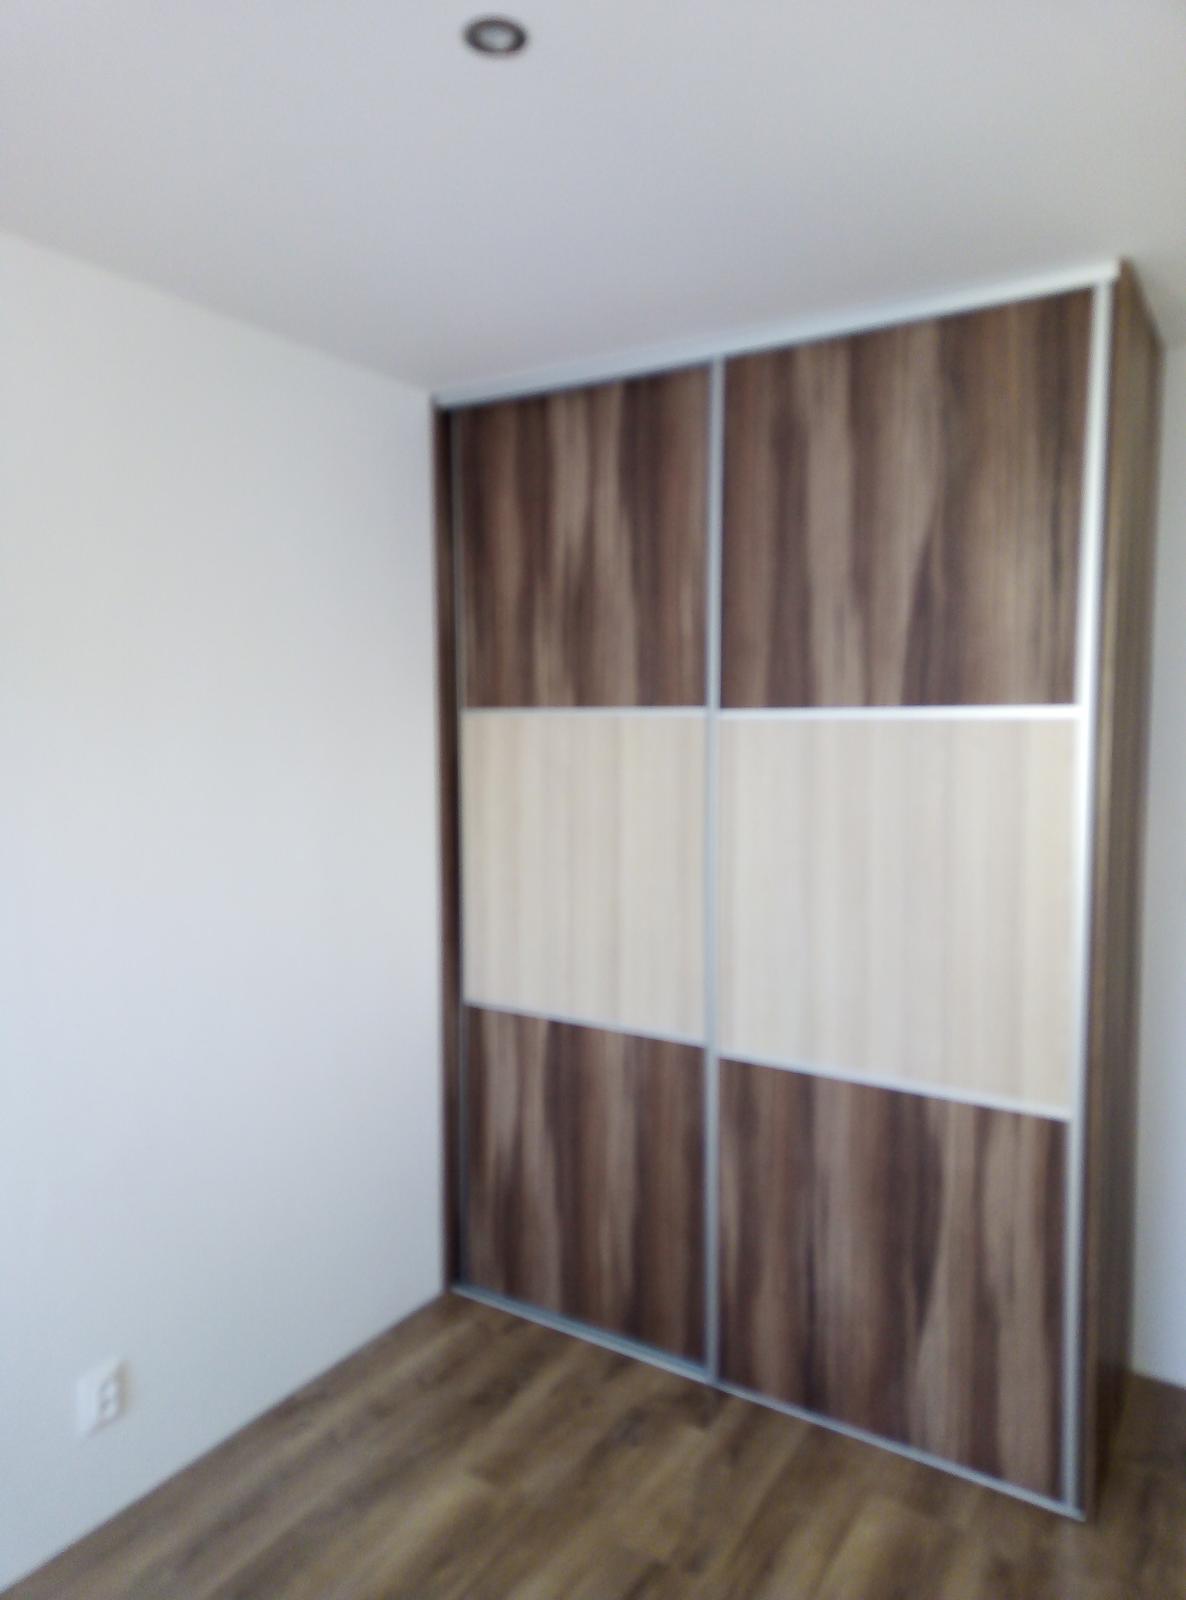 Vstavané skrine Martin Benko Bošany - Obrázok č. 8